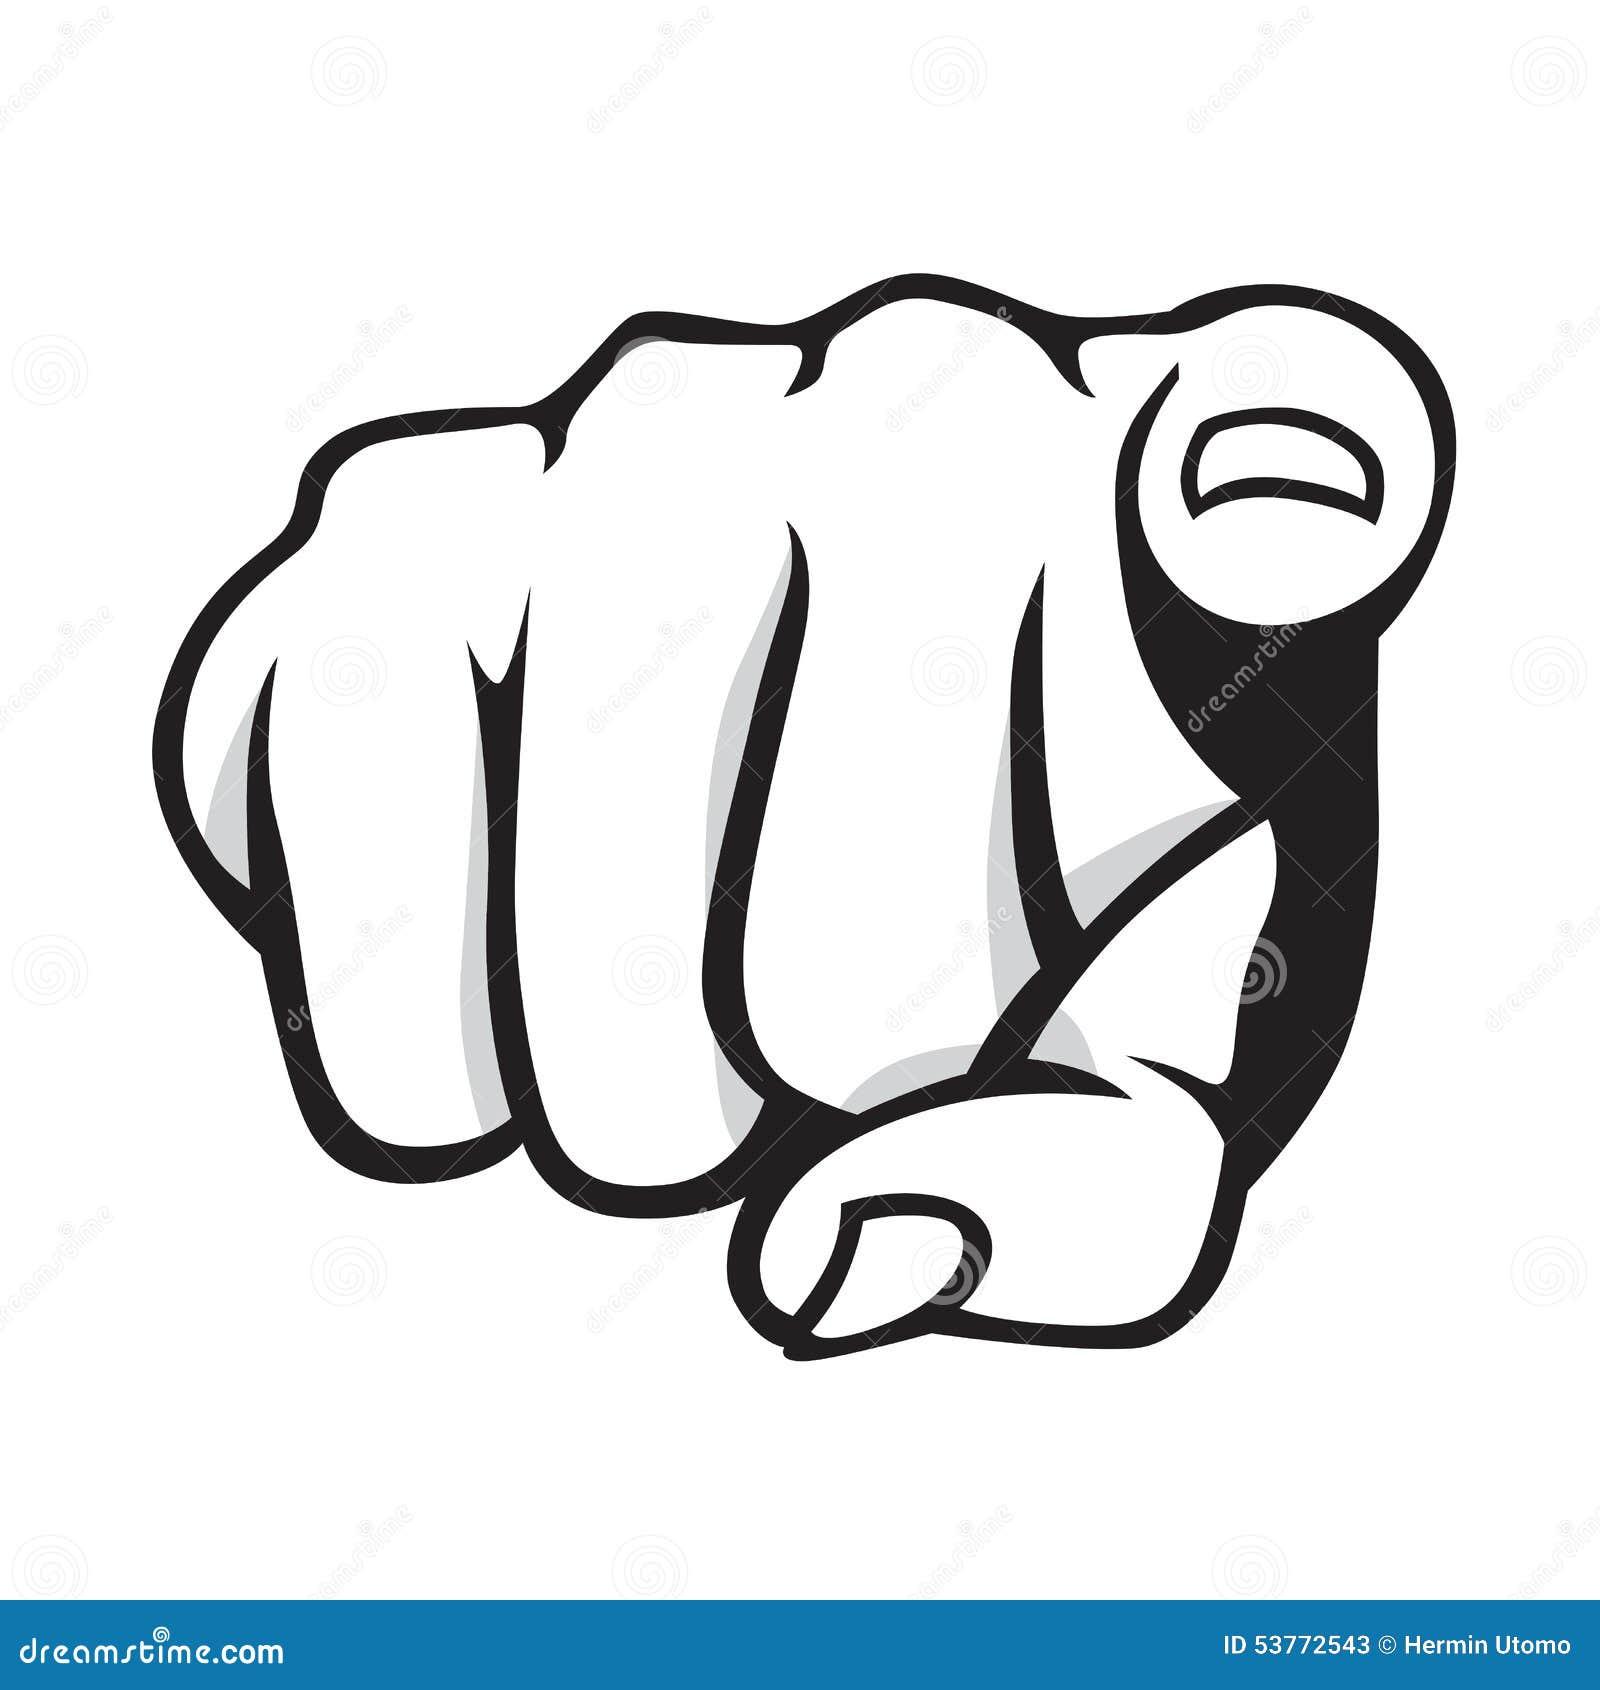 pointing finger stock vector illustration of gesturing 53772543 rh dreamstime com pointing finger vector free vintage pointing finger vector